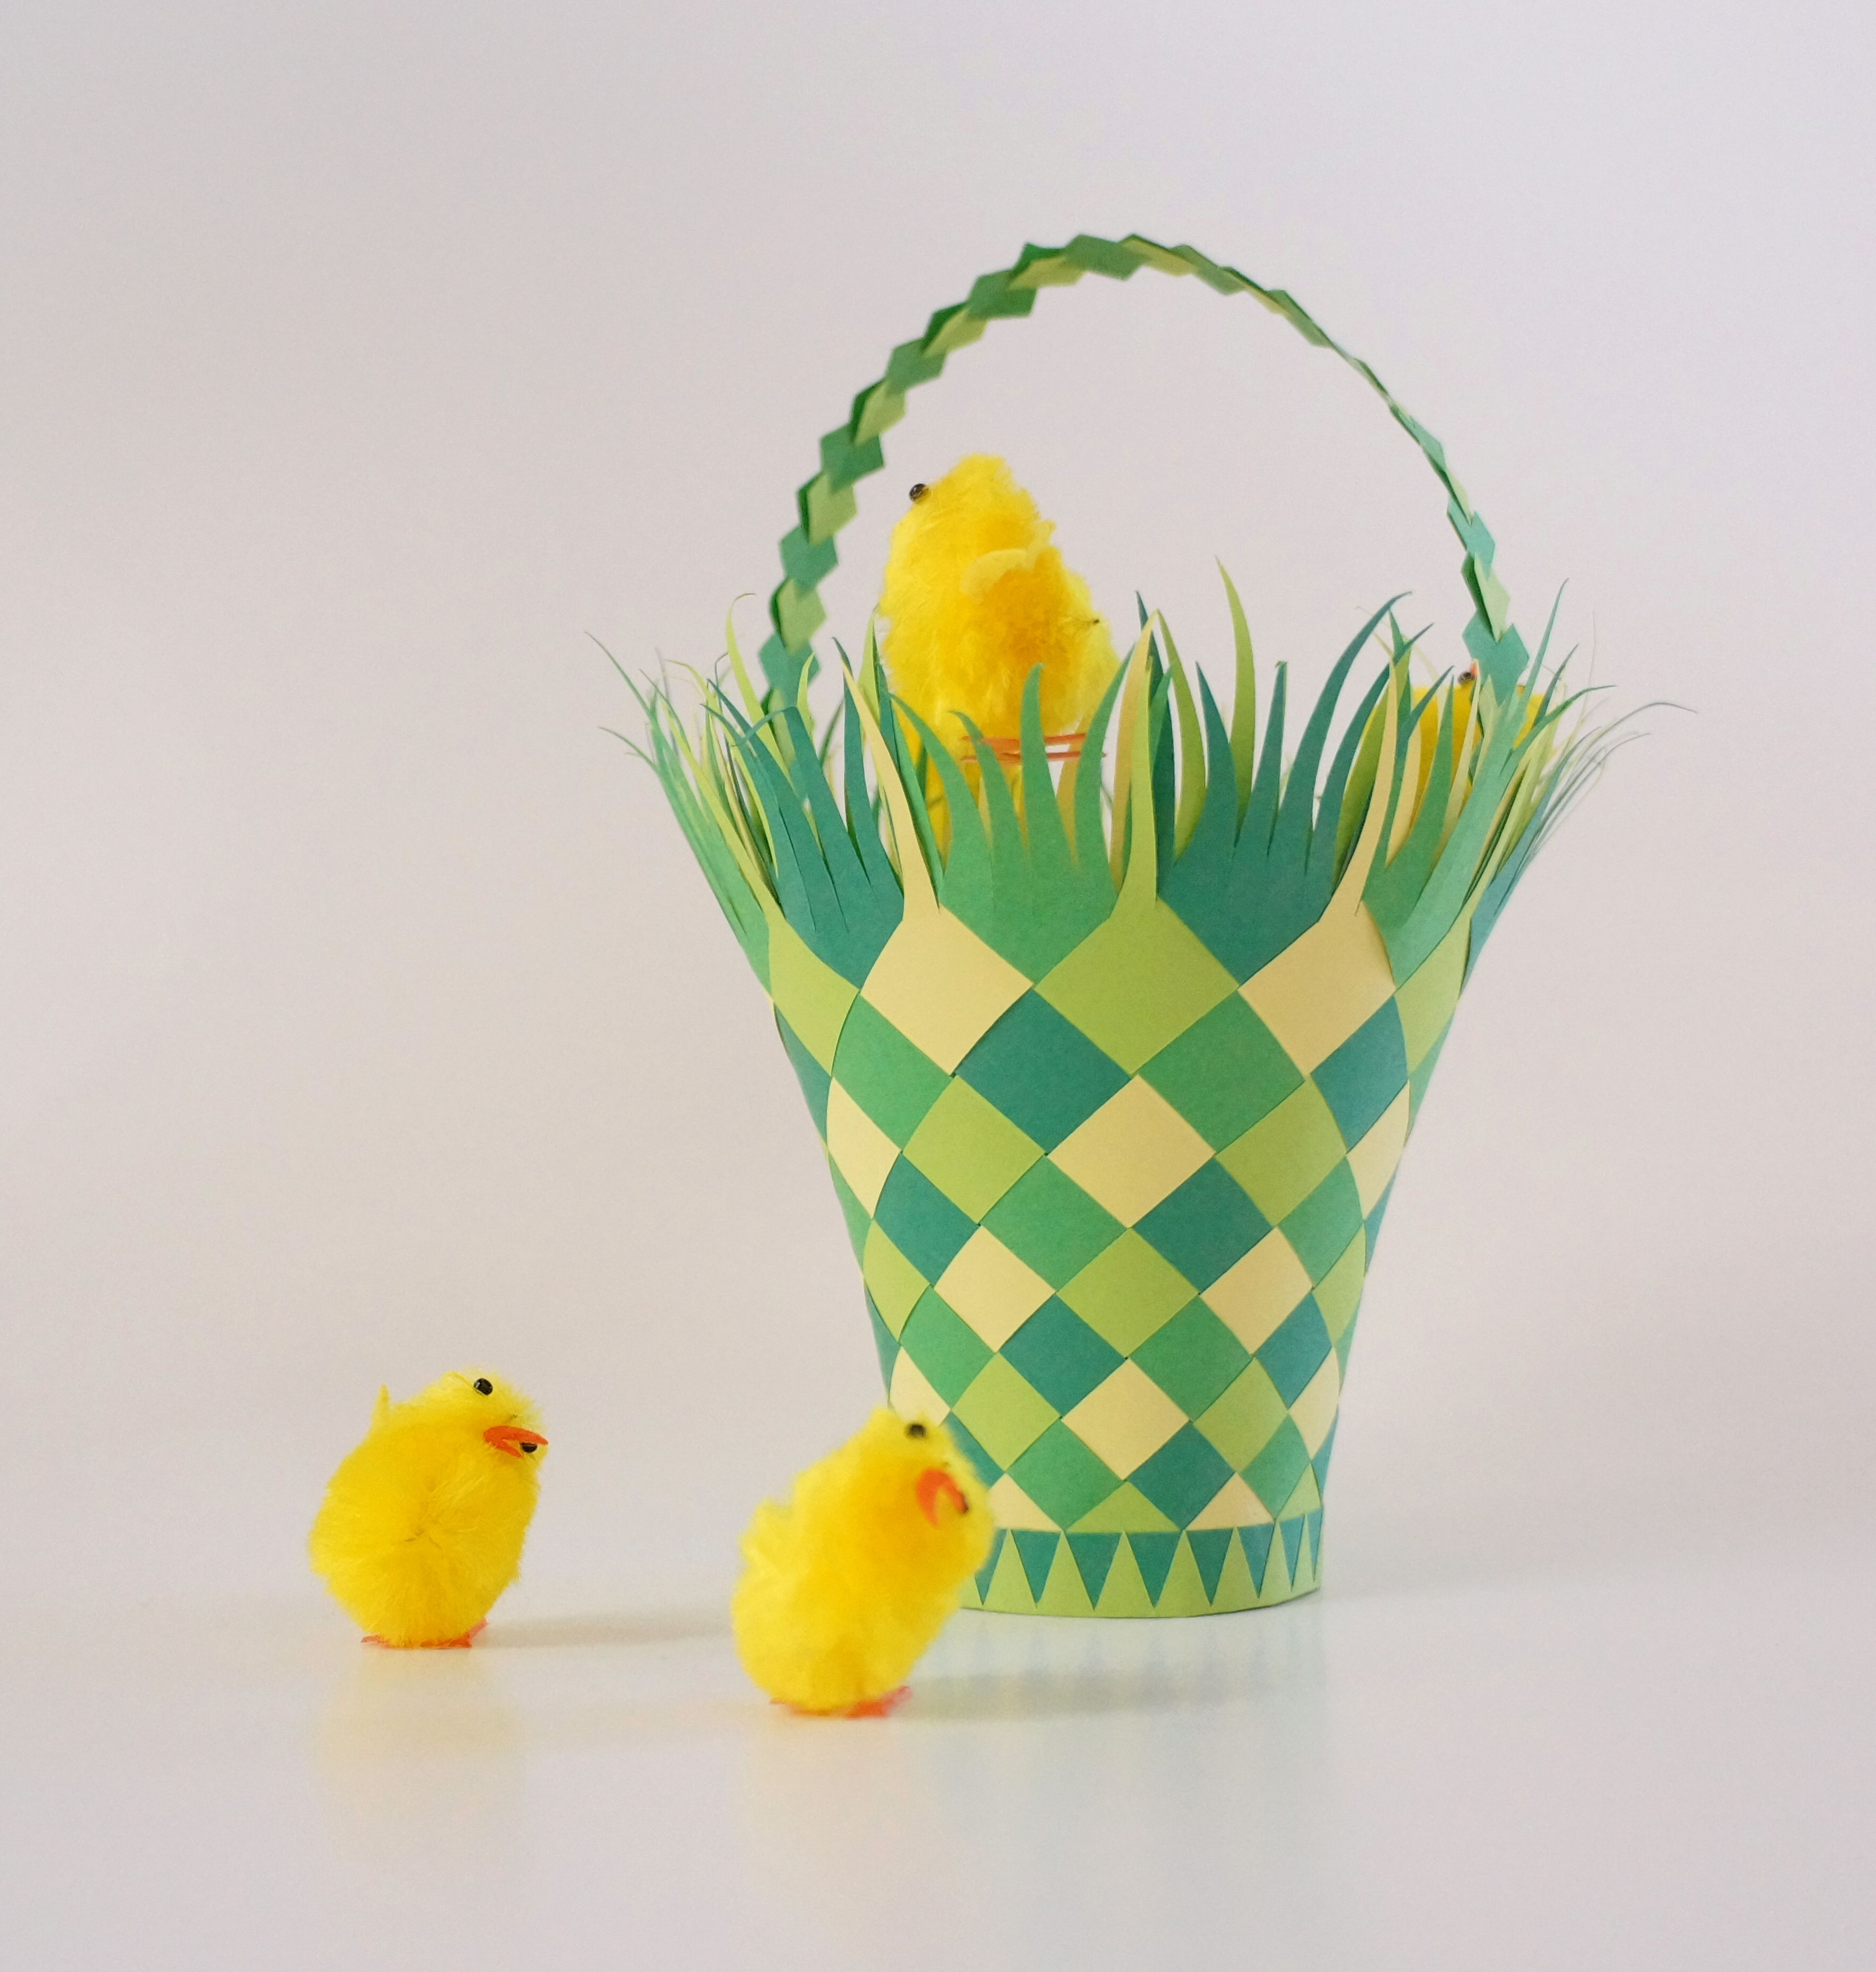 Easter basket easter baskets easter and crafty craft easter basket 2 negle Choice Image